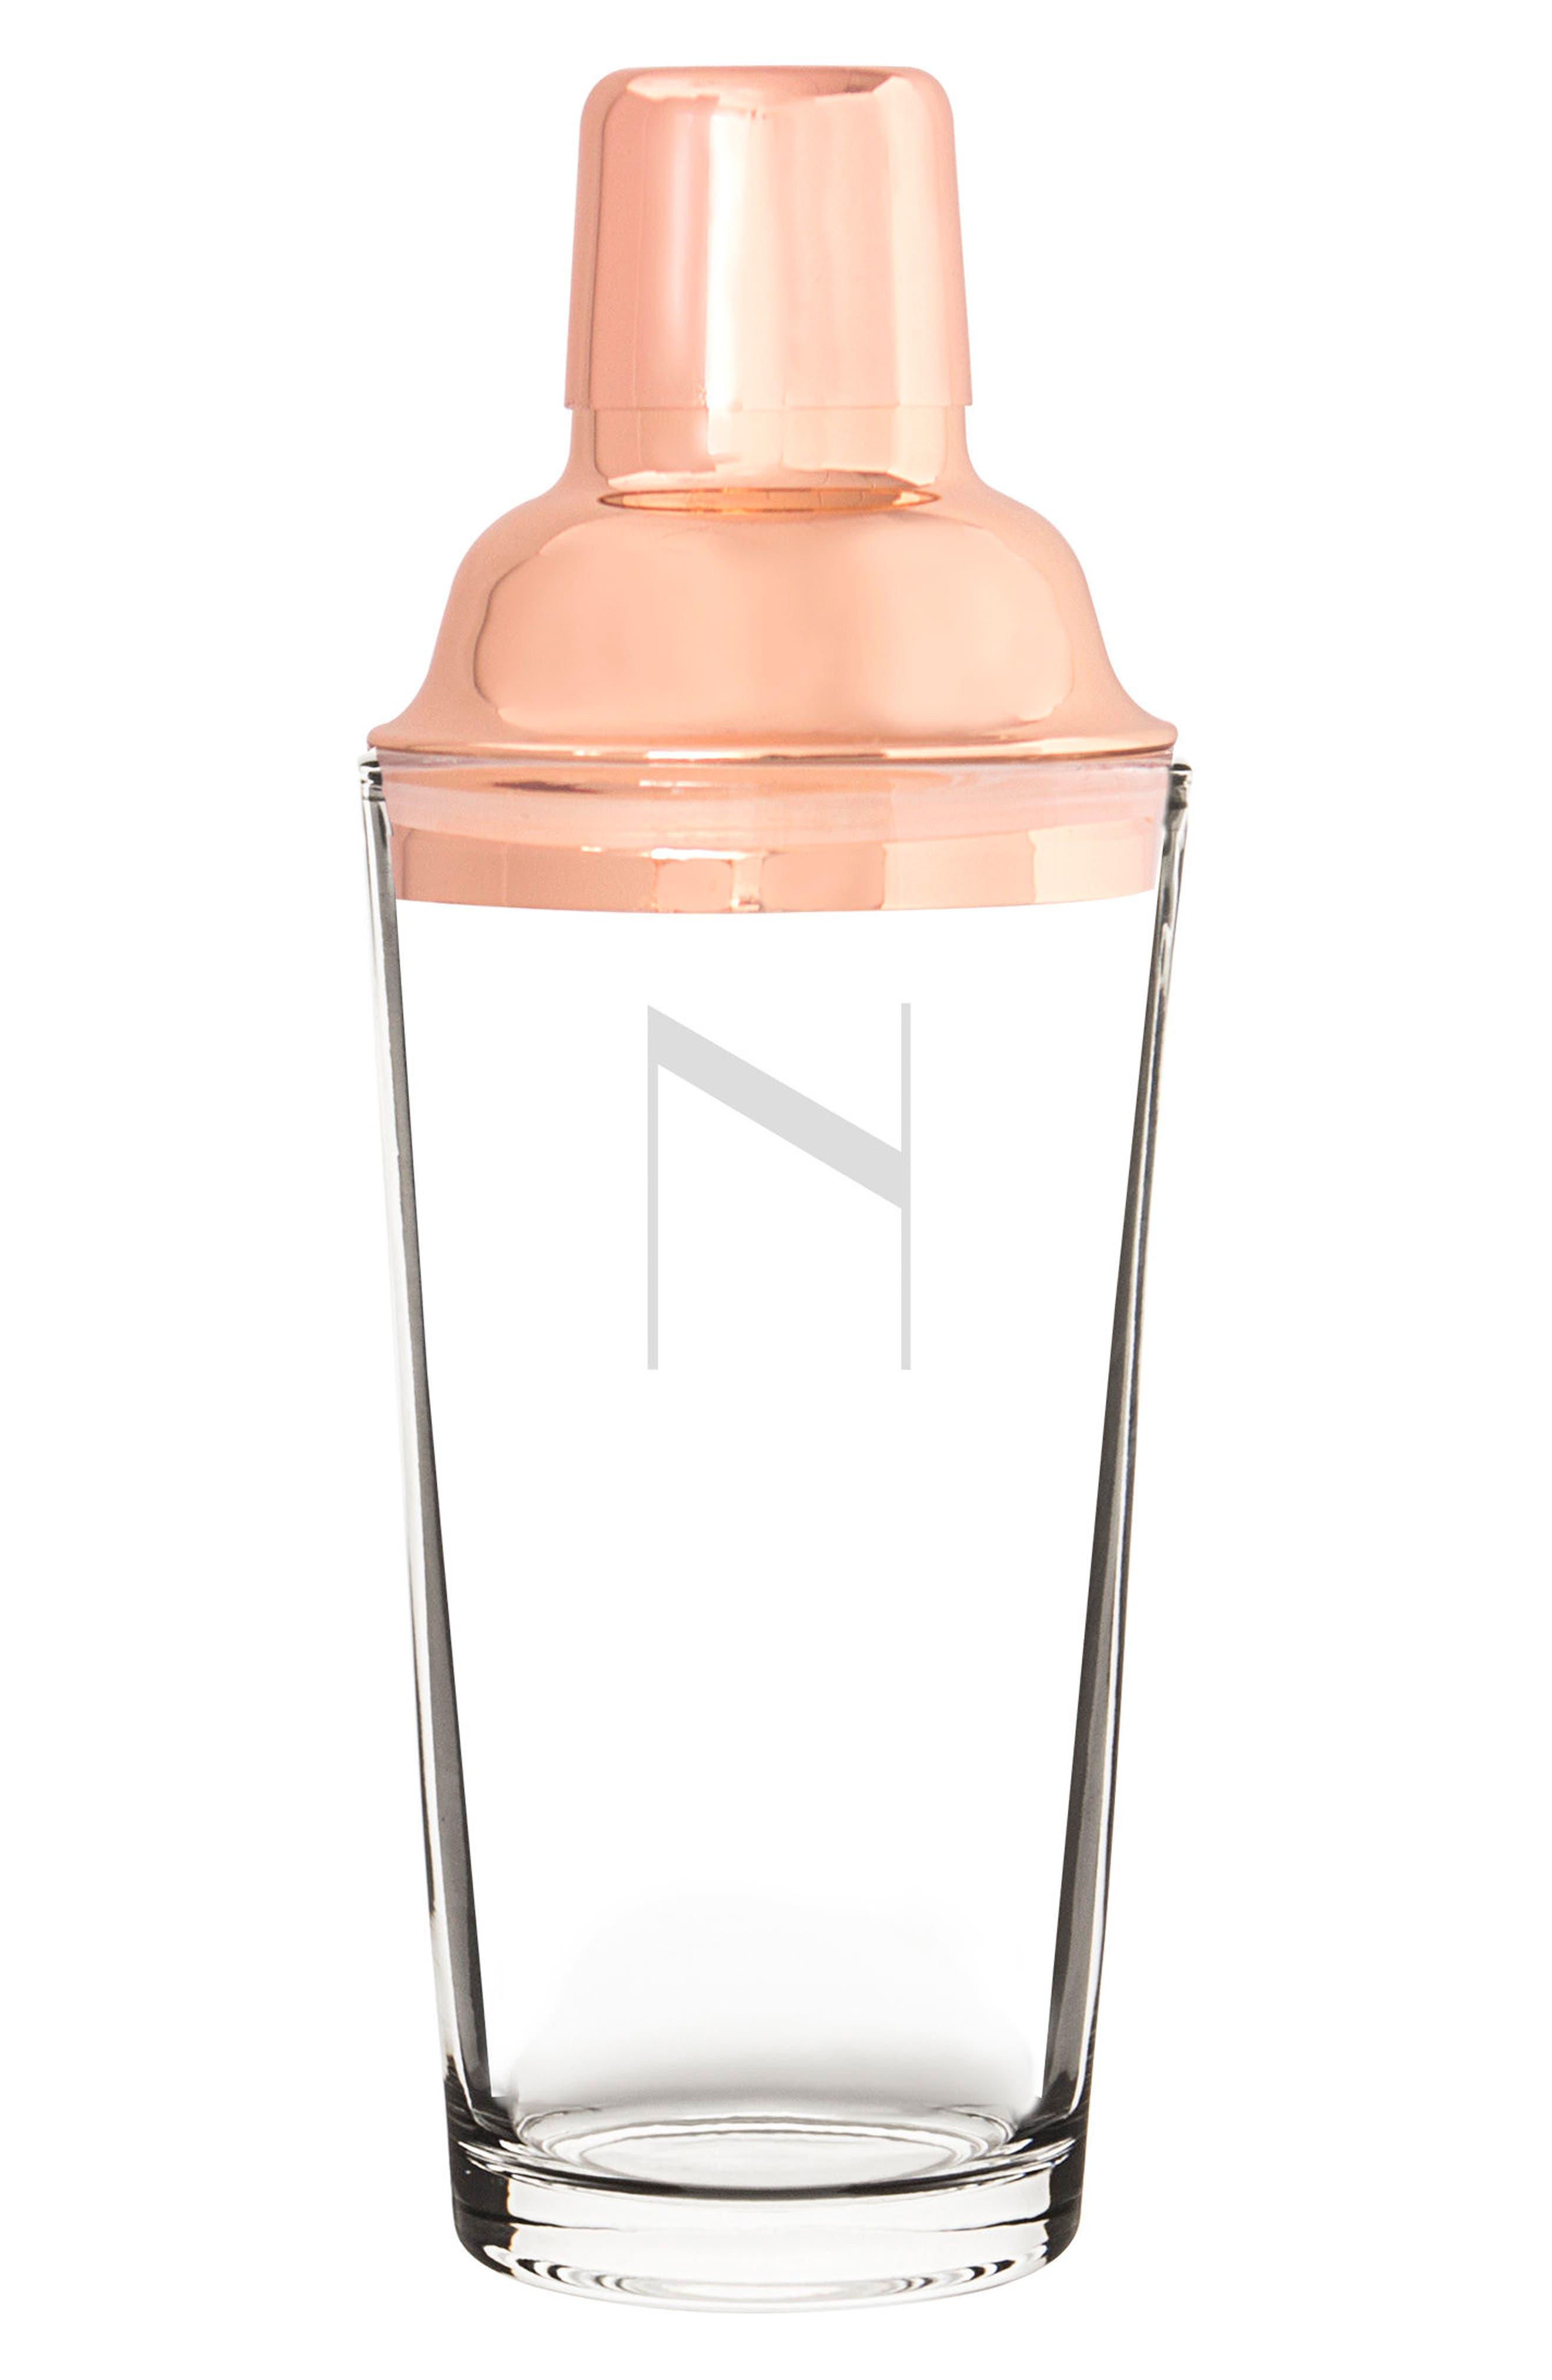 Monogram Coppertone Cocktail Shaker,                             Main thumbnail 15, color,